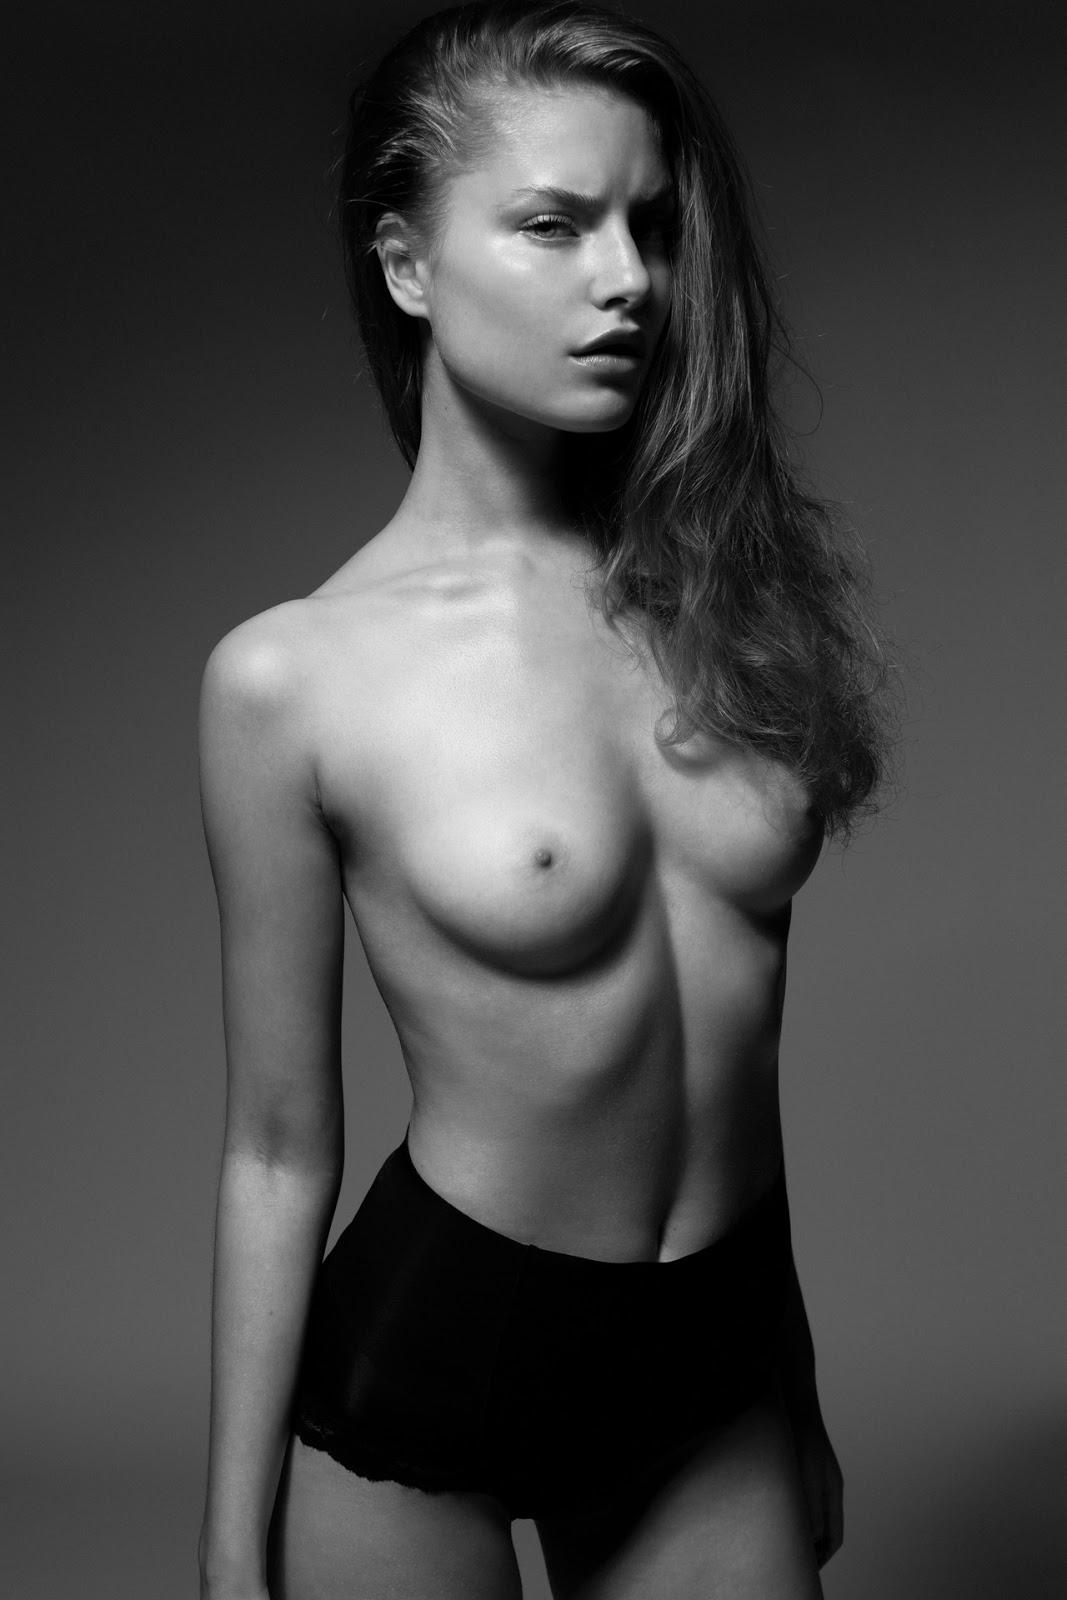 nudes (74 photo), Pussy Celebrites fotos